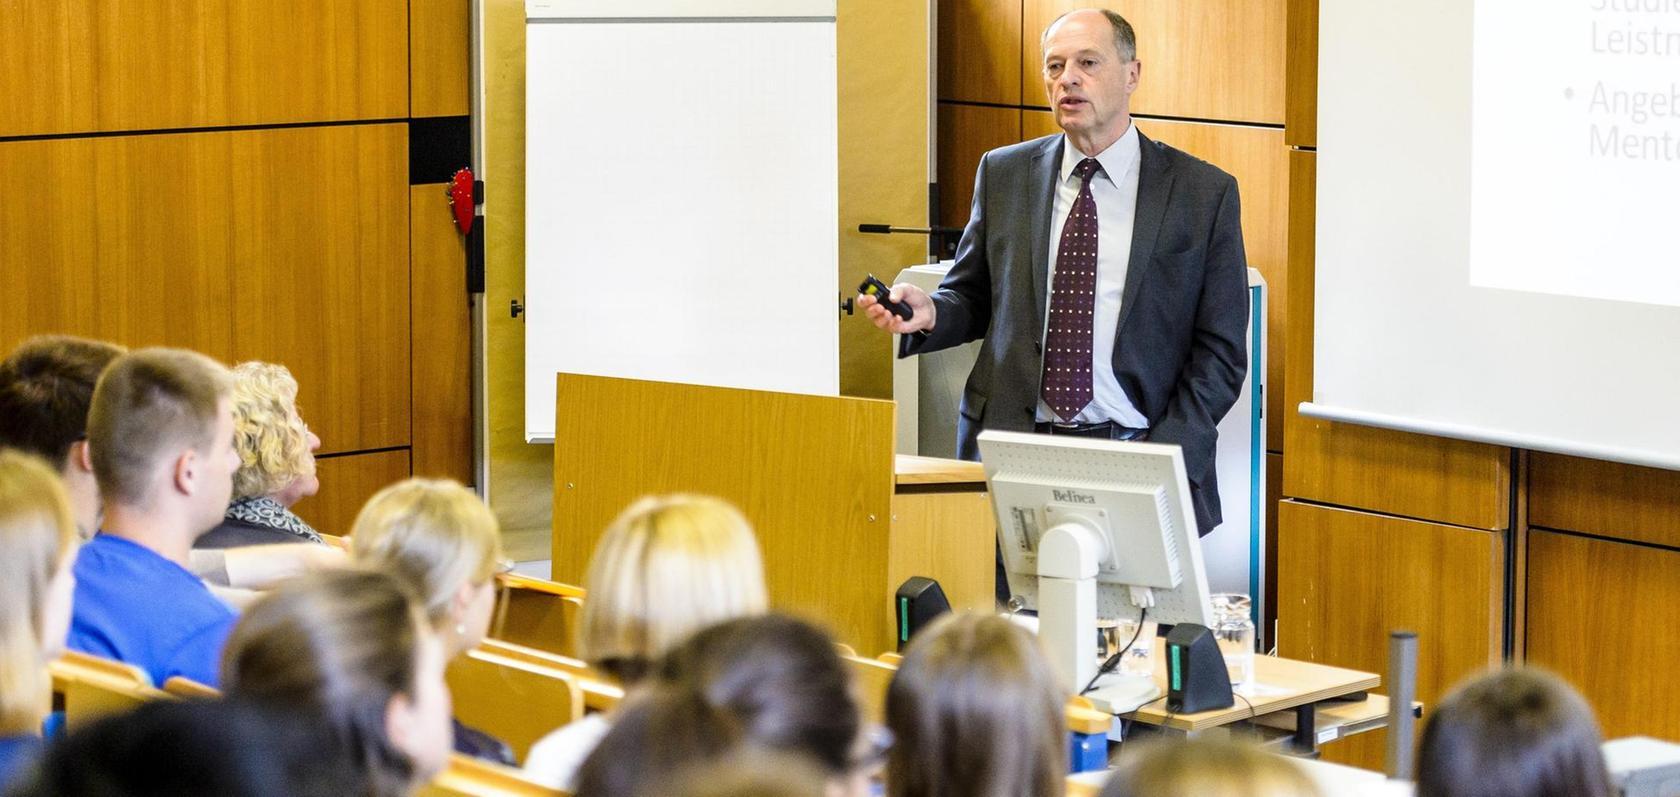 Prof. Wolfgang Söllner beim Unterricht an der PMU in Nürnberg.